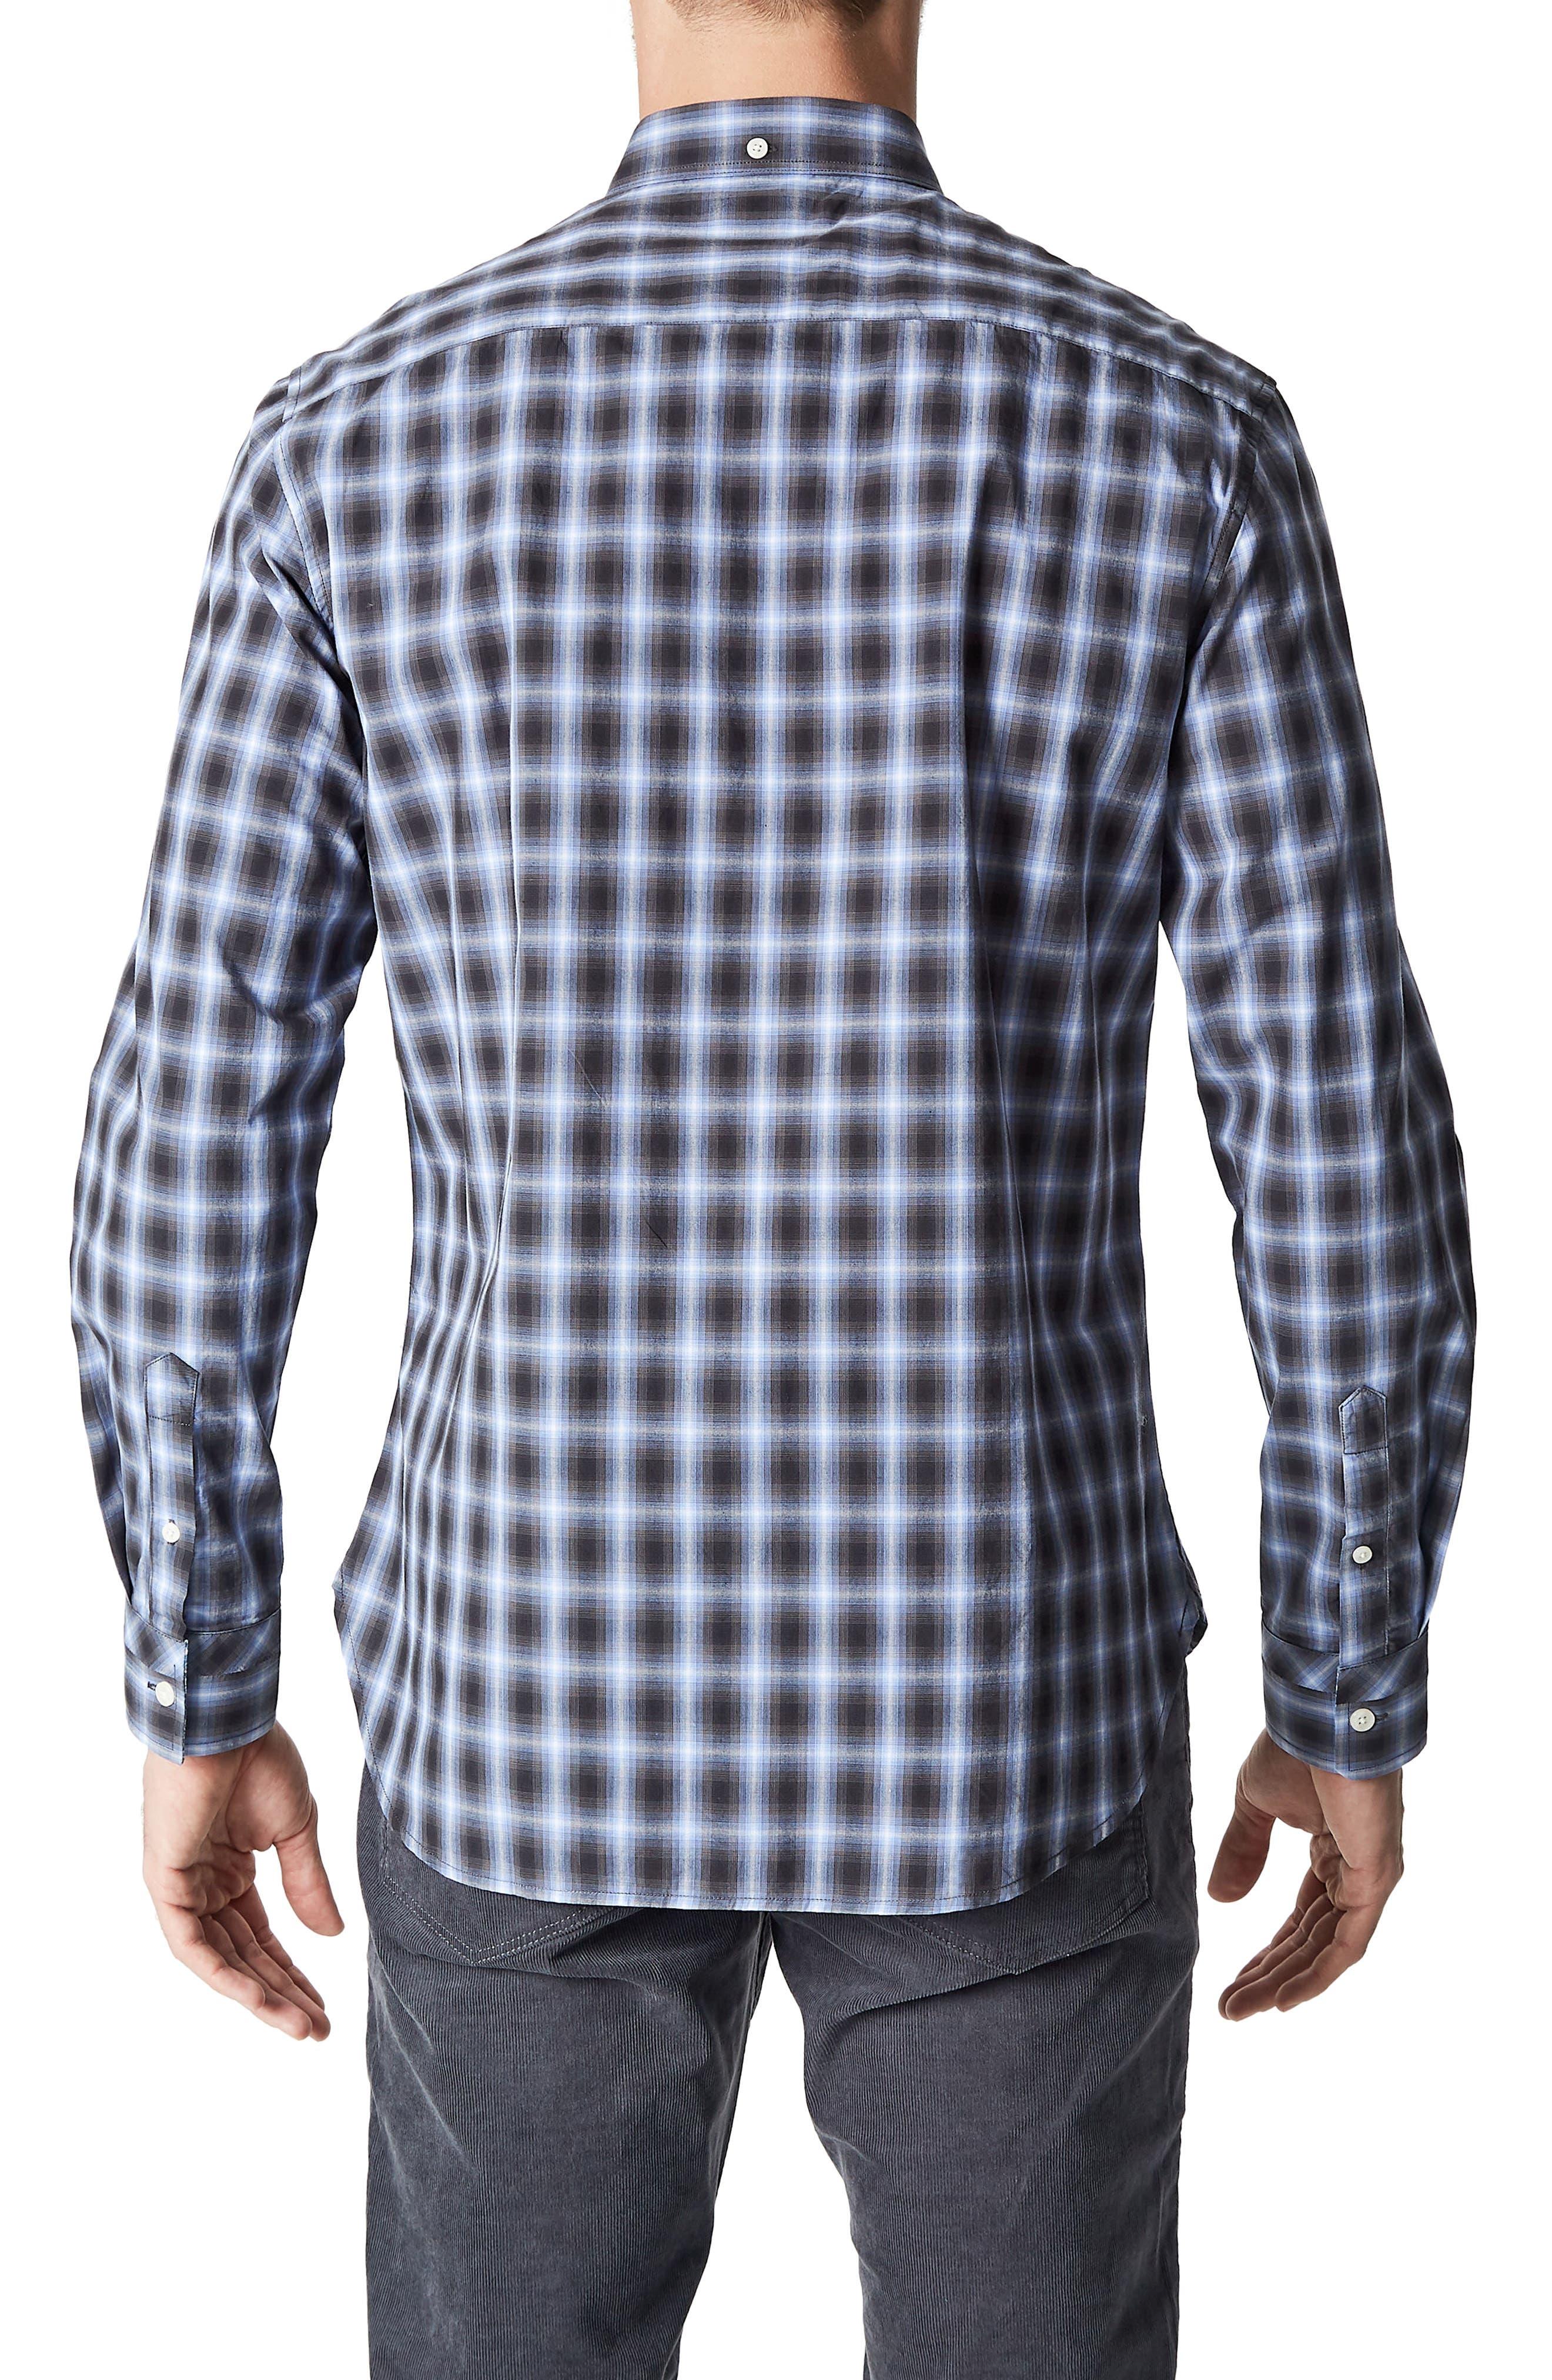 027bbb92 All Men's XXL (Neck Size 18-18.5): Sale | Nordstrom